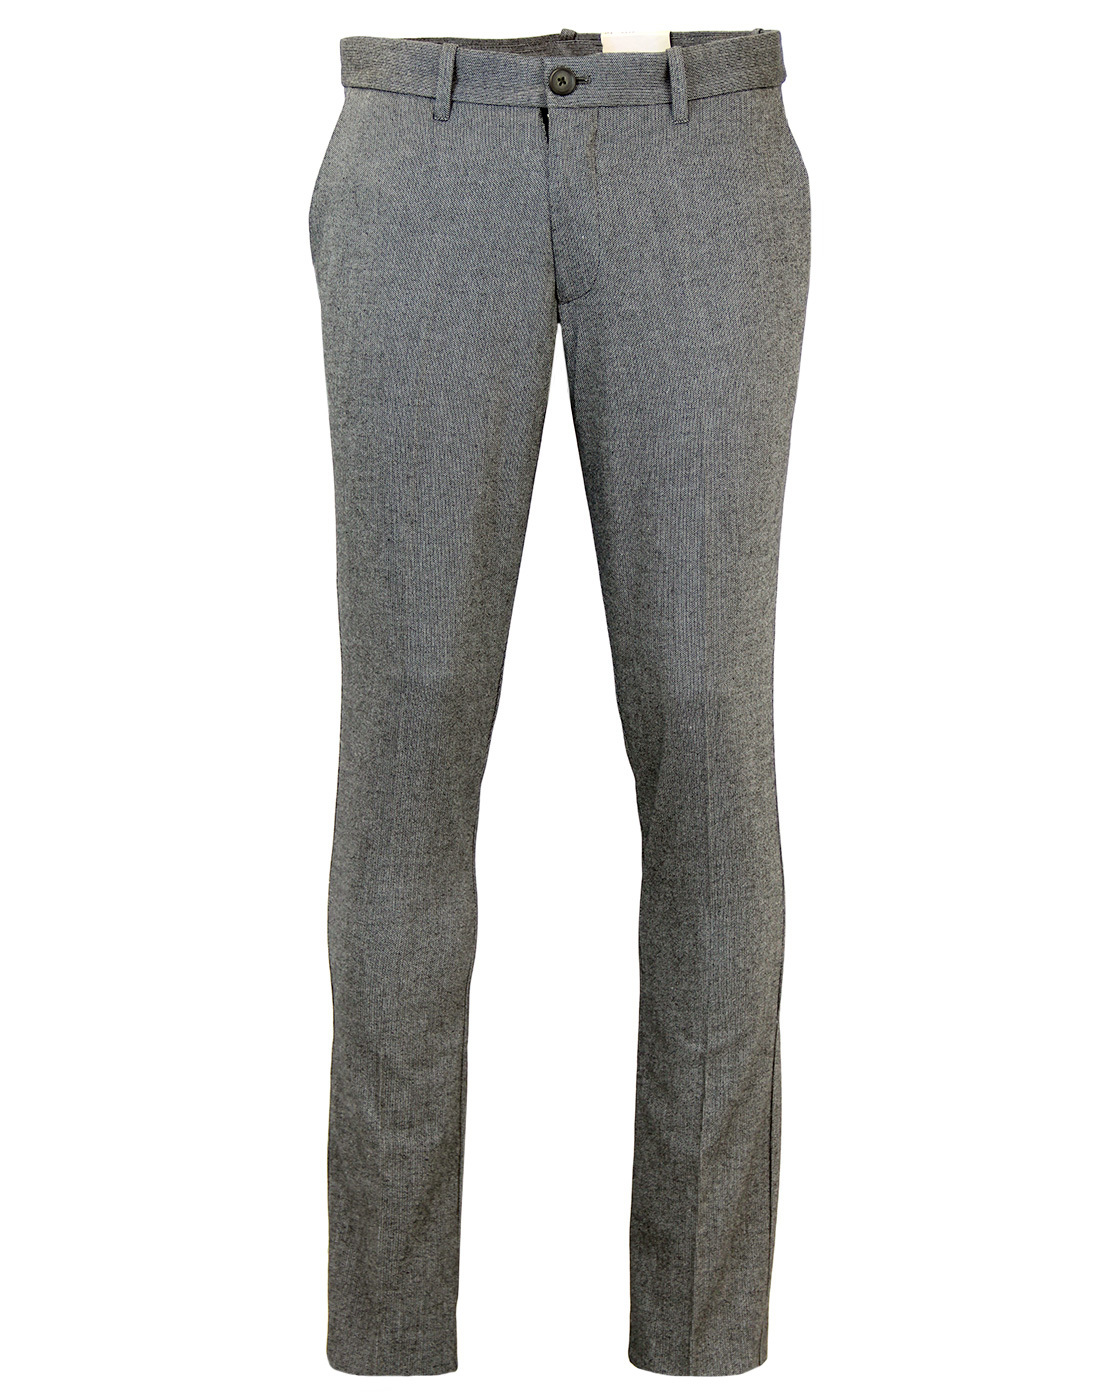 ORIGINAL PENGUIN Retro Mod Sixties Suit Trousers